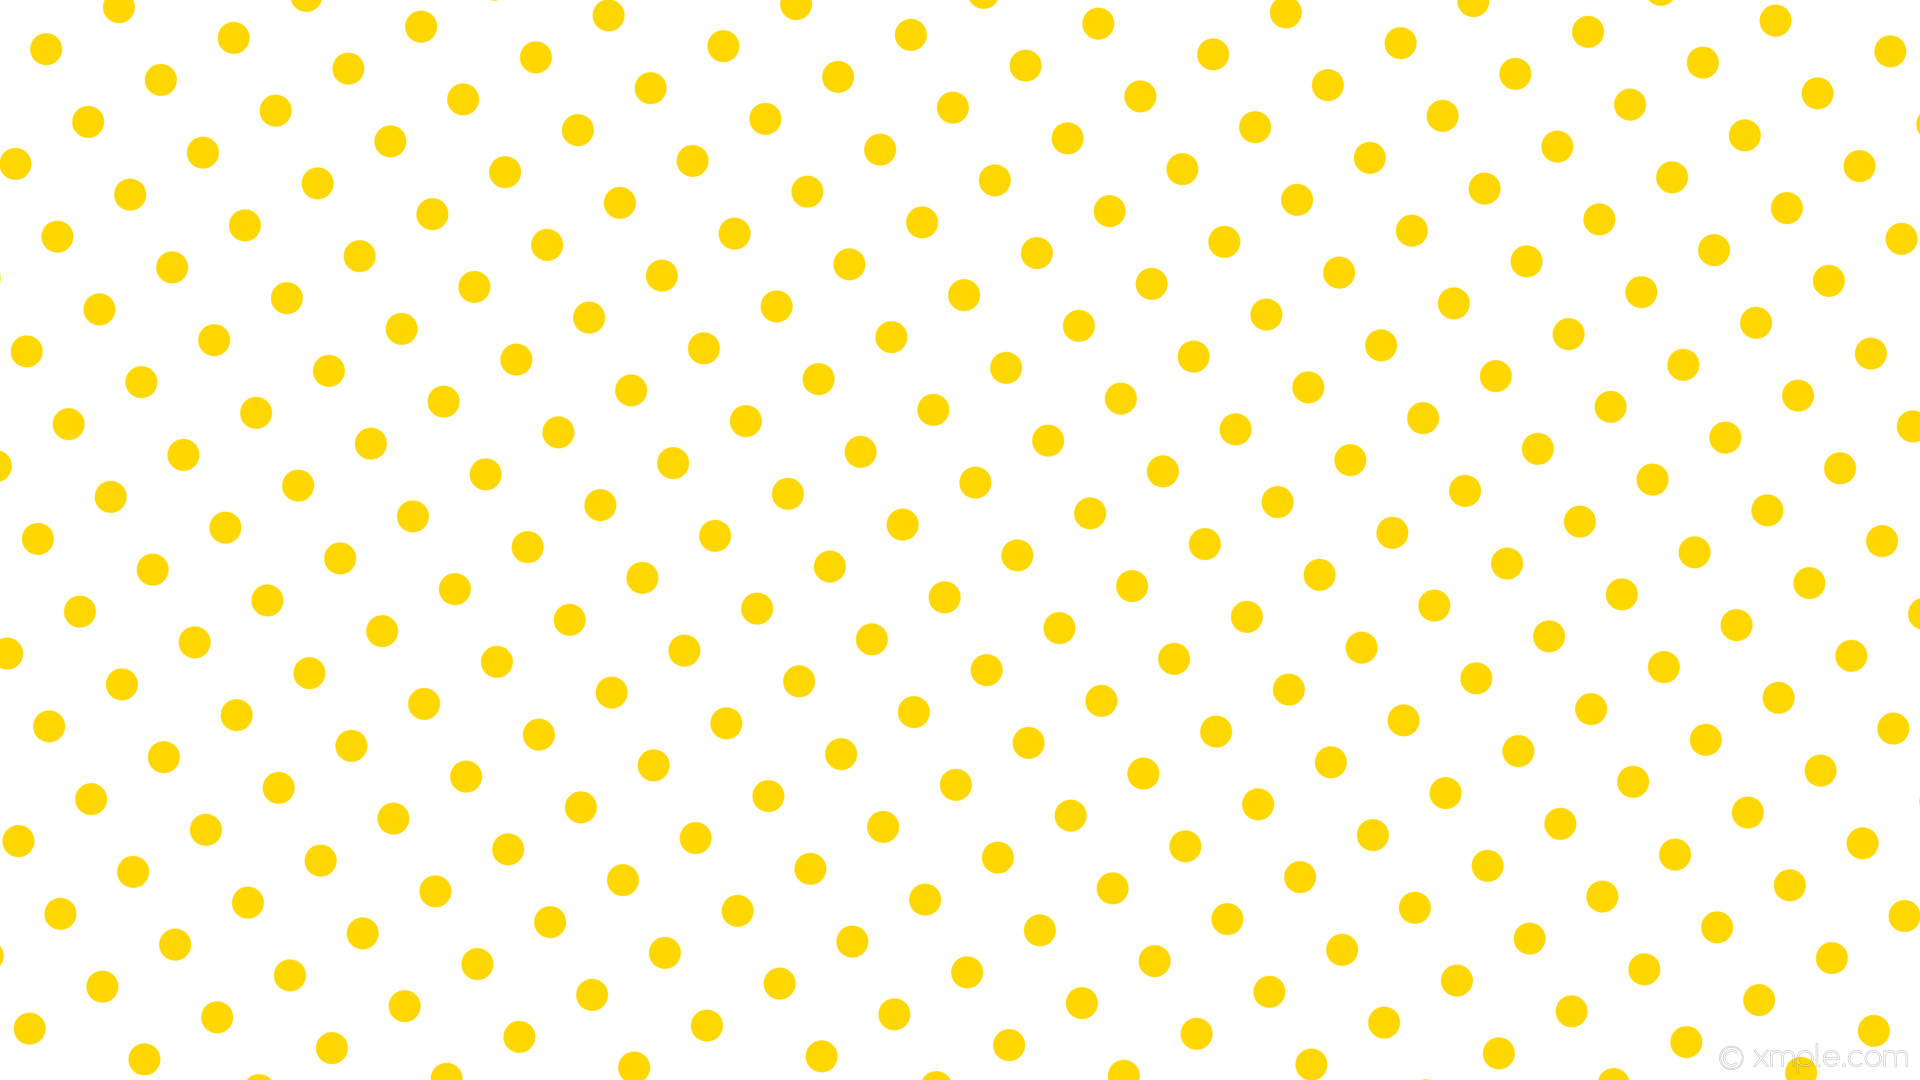 wallpaper white polka dots yellow spots gold #ffffff #ffd700 300° 32px 84px